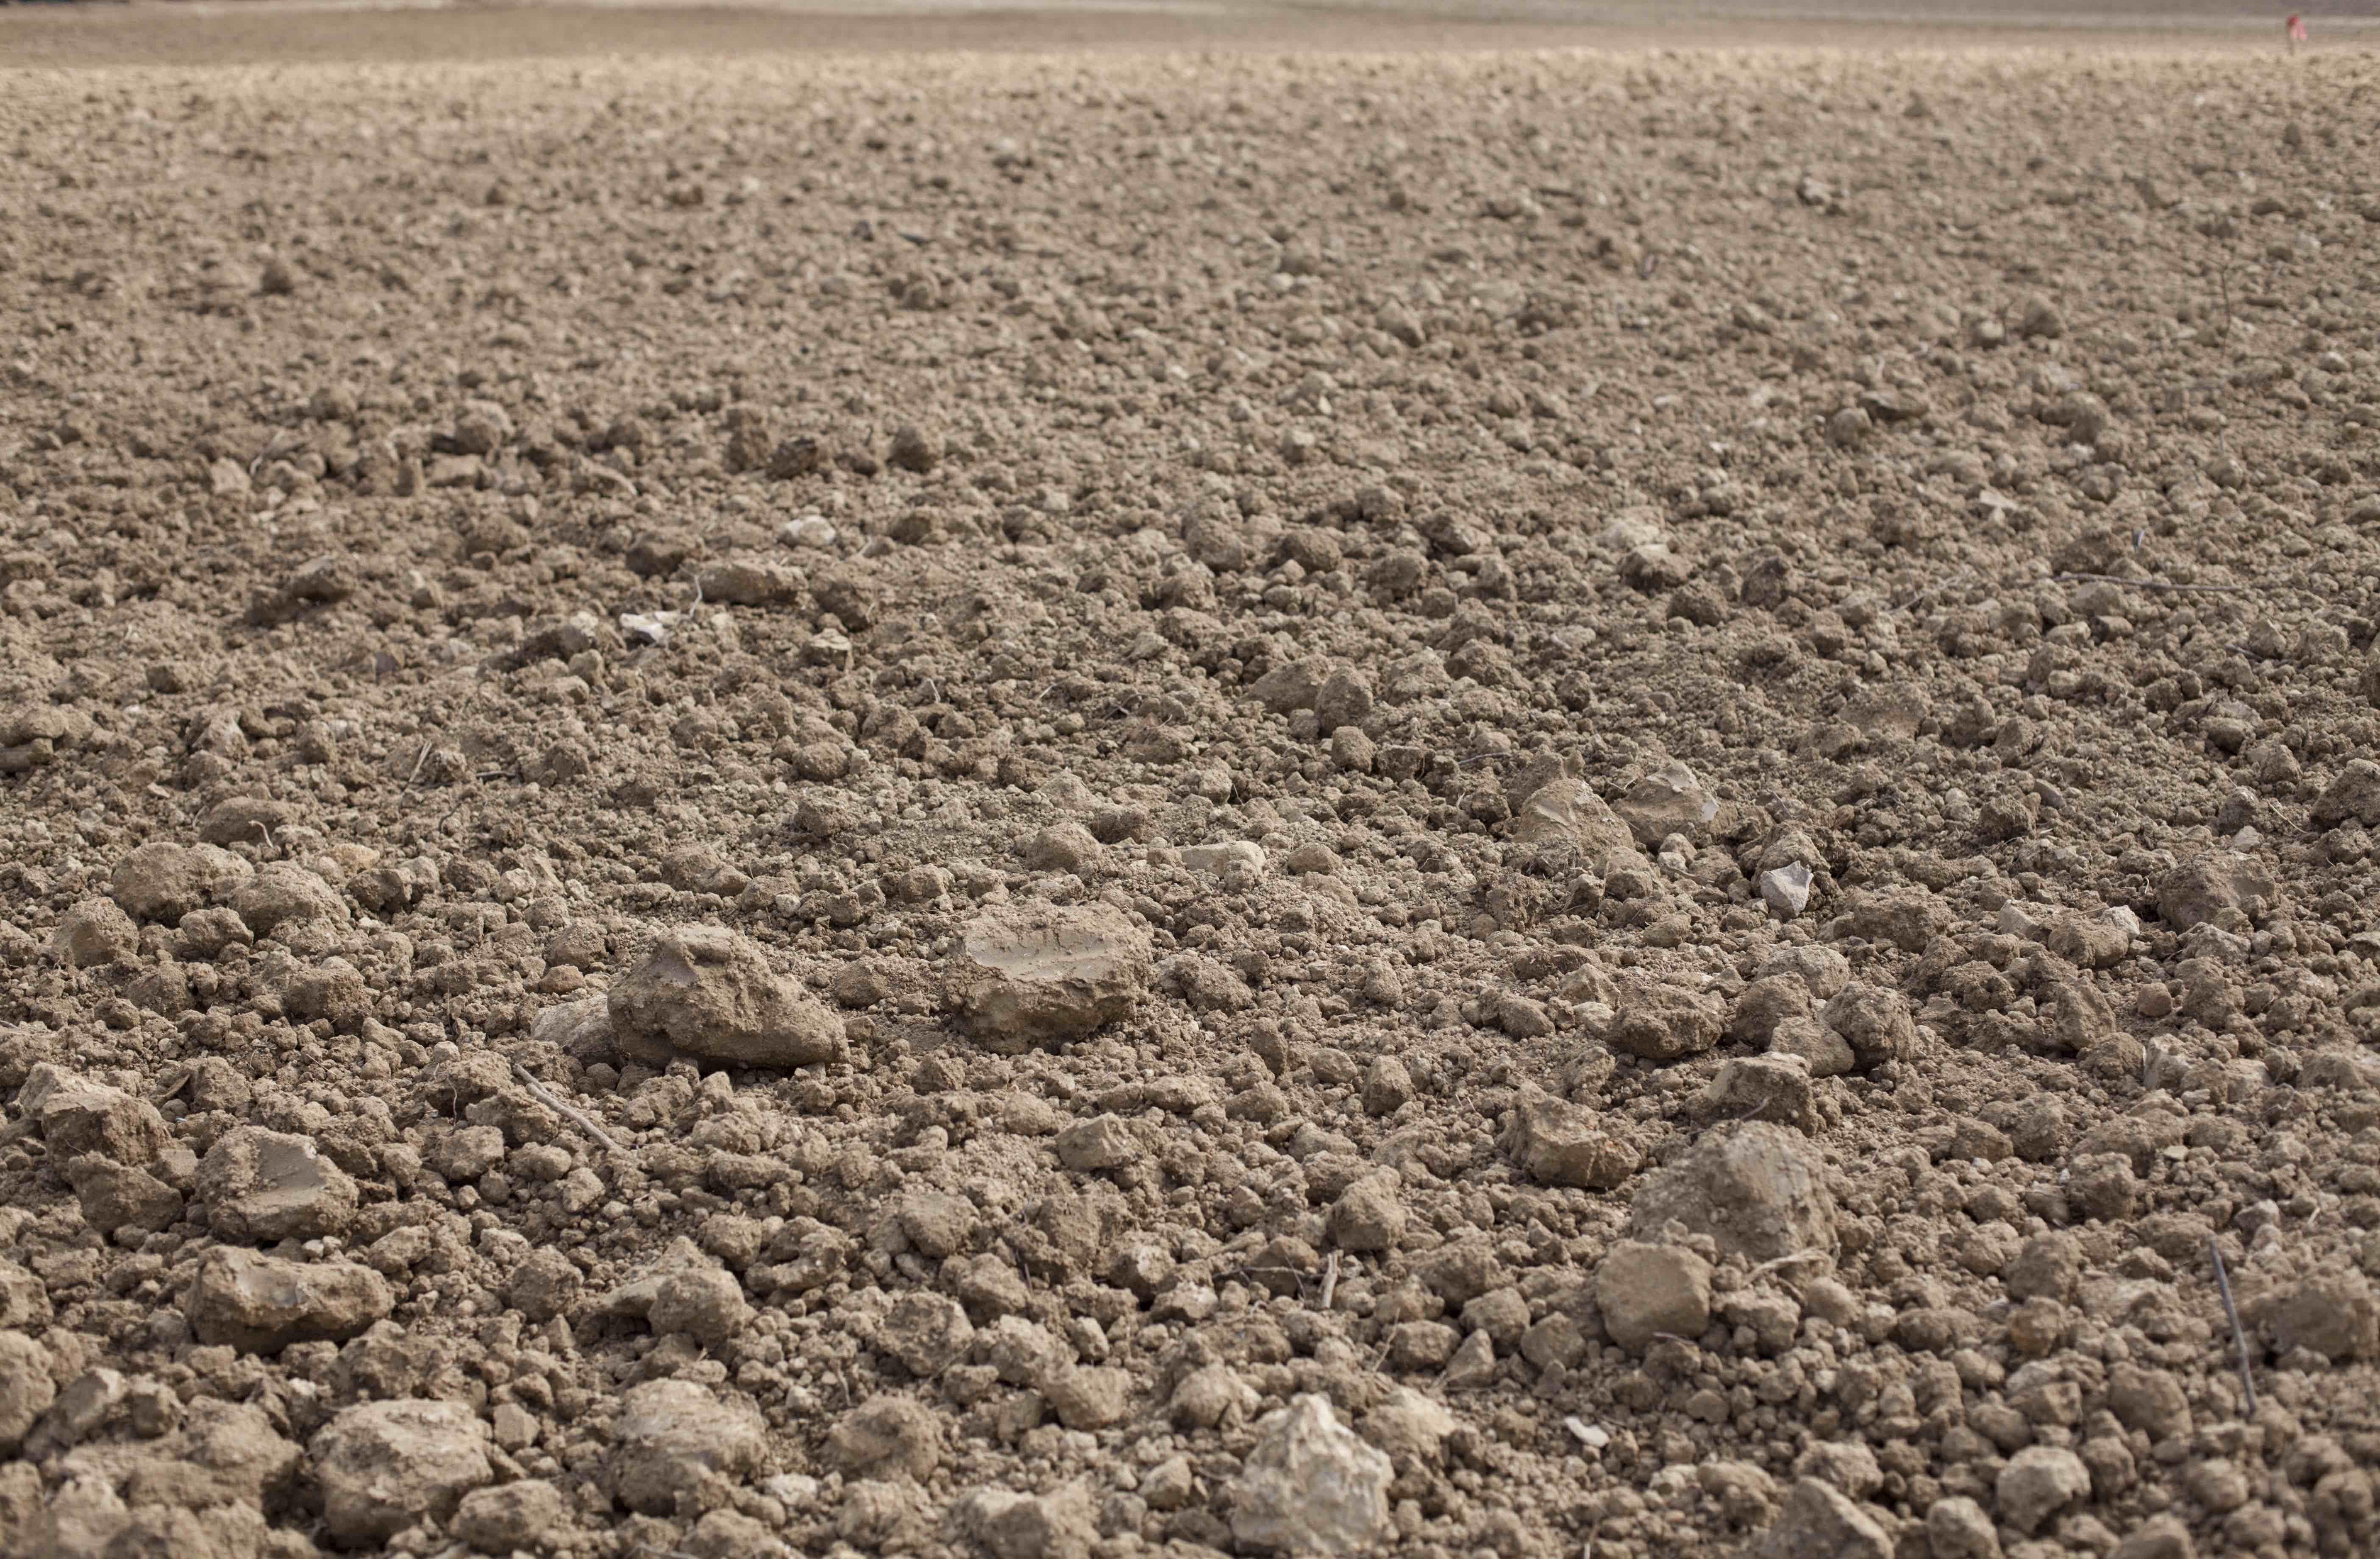 Montornello's Soils